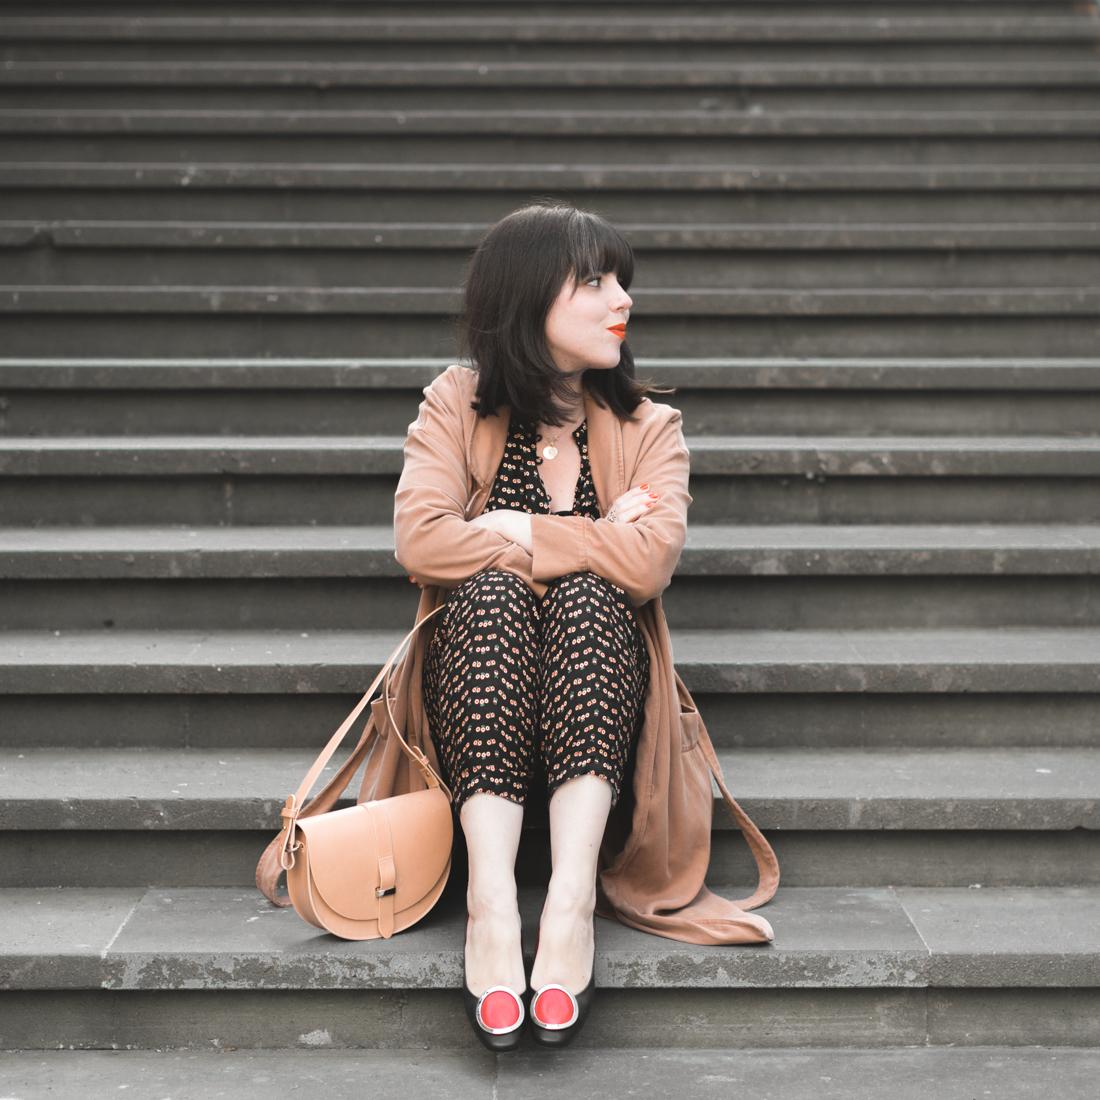 1100-combi_sezane_sac_claude_ballerines-chaussures-exclusif-paris_Pauline_Privez_paulinefashionblog_com-2